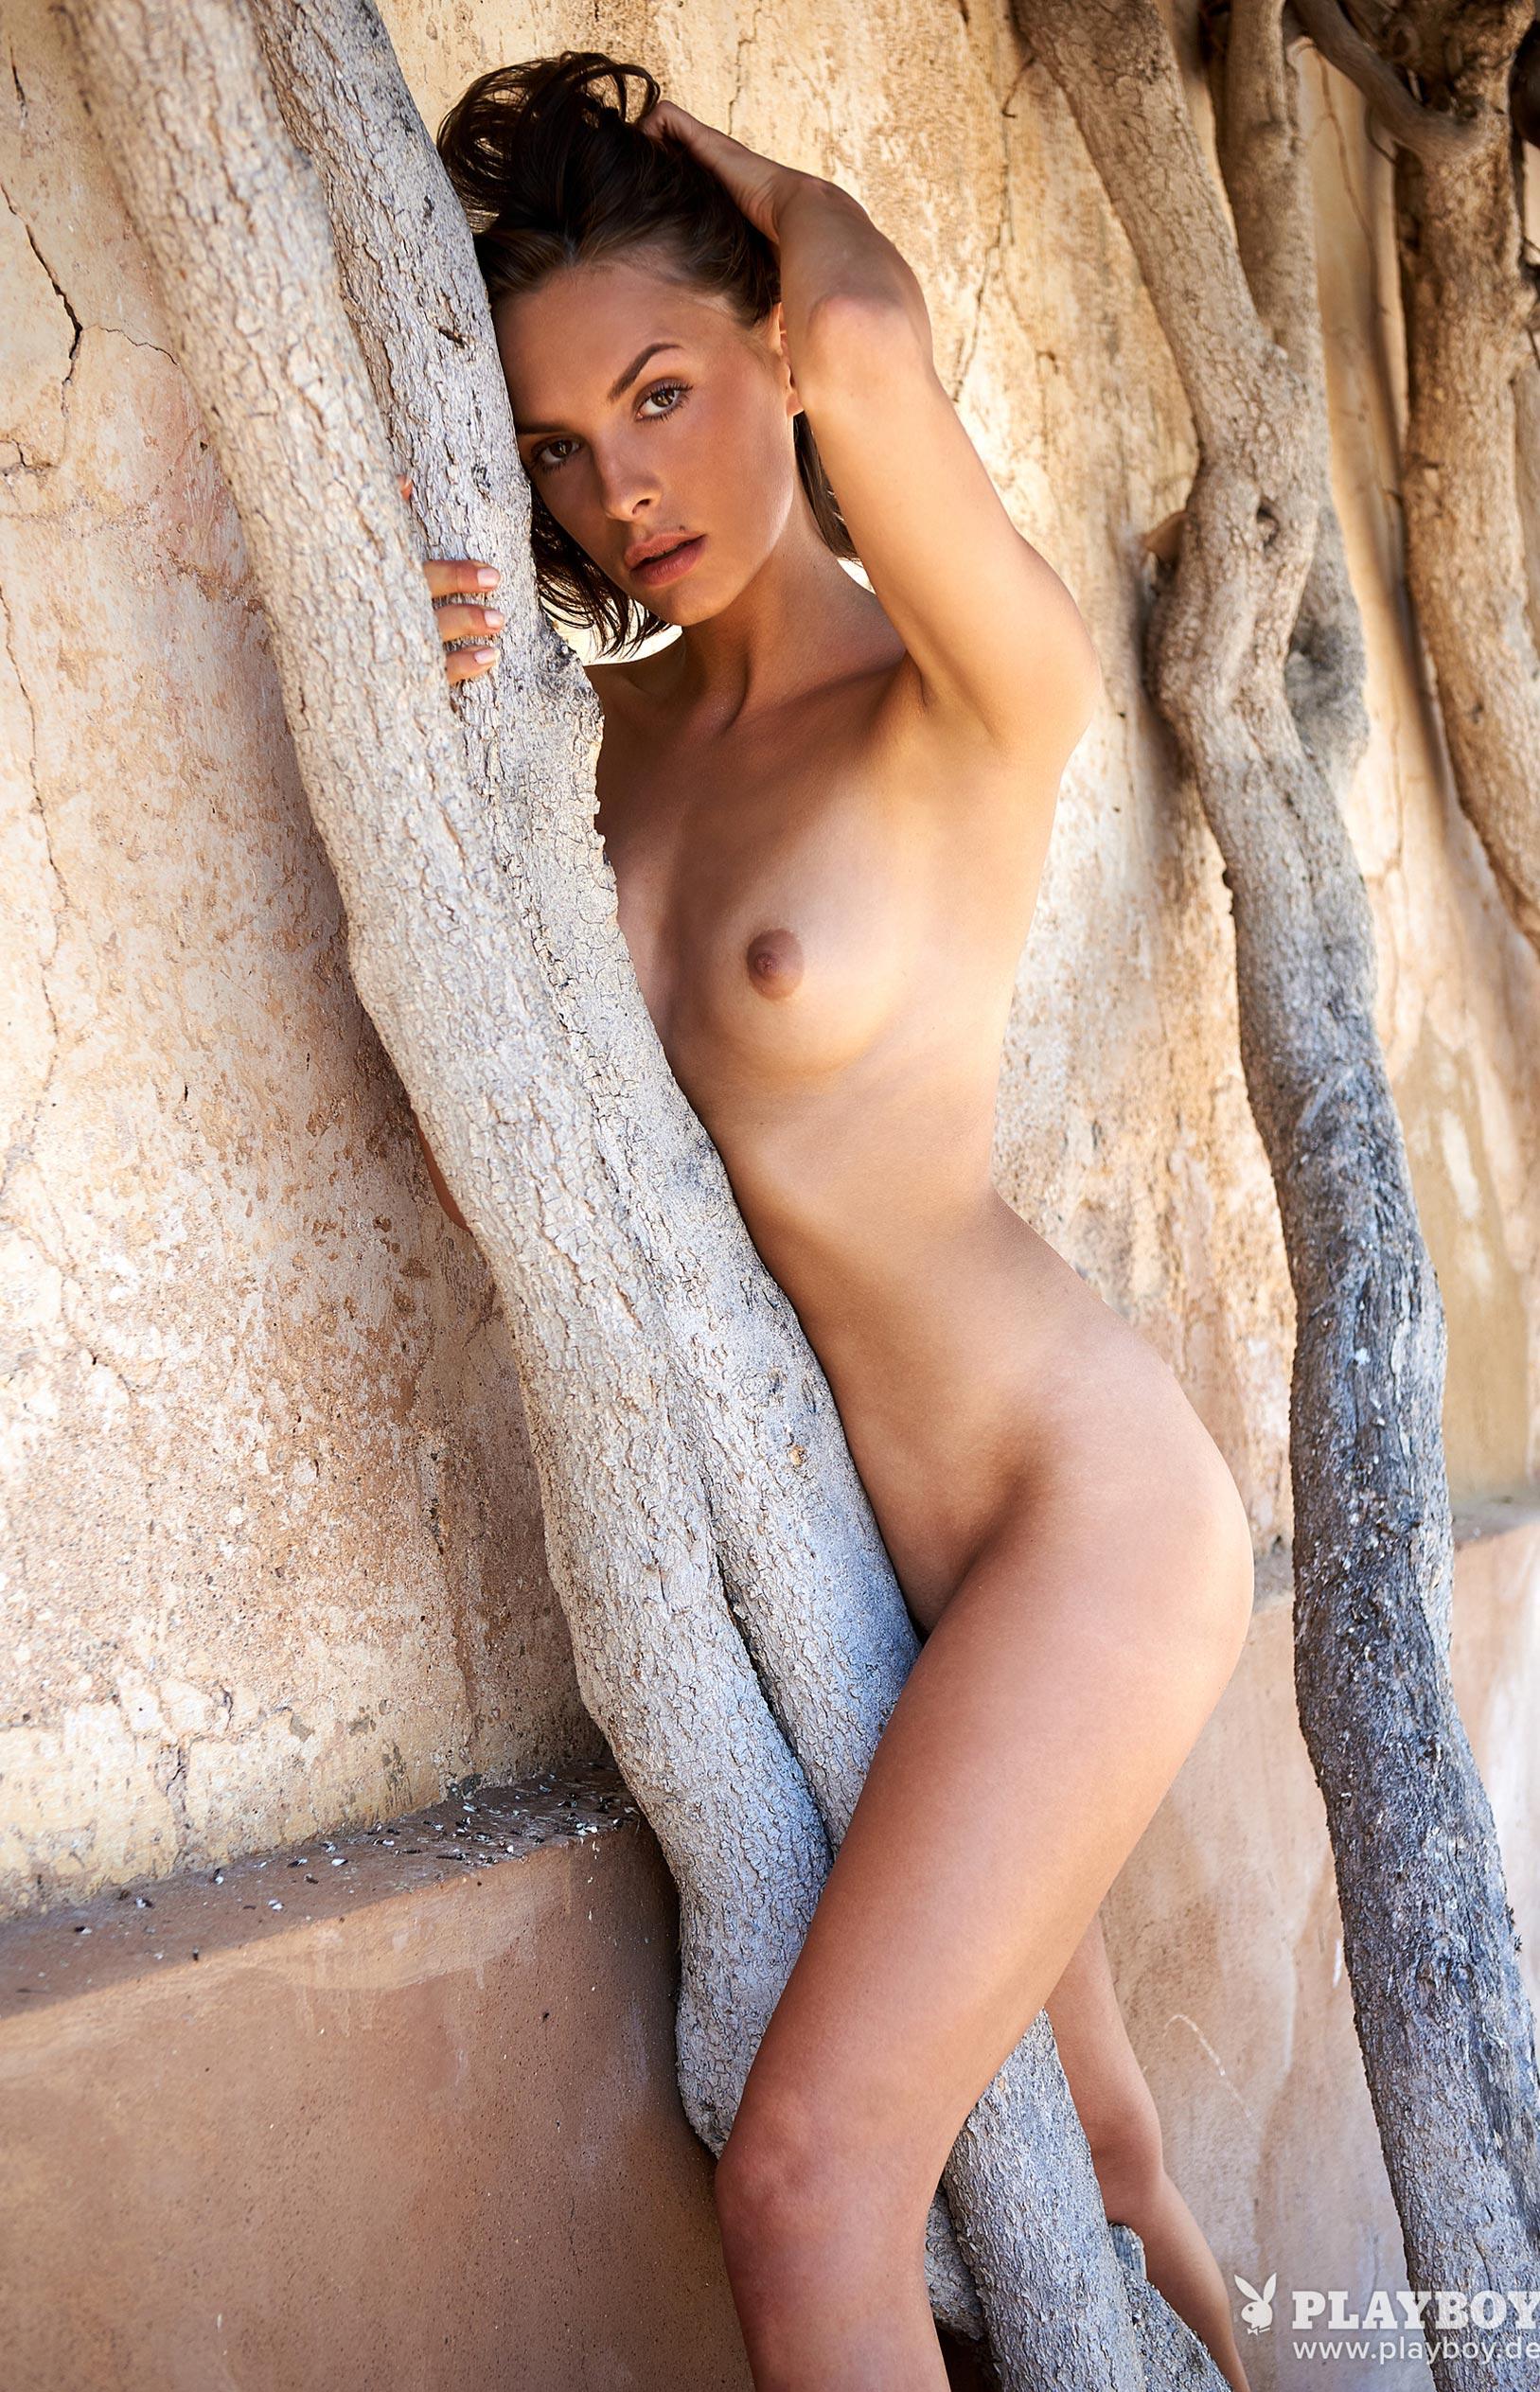 Оливия Пельцер - Девушка месяца Playboy Германия, сентябрь 2018 / фото 20